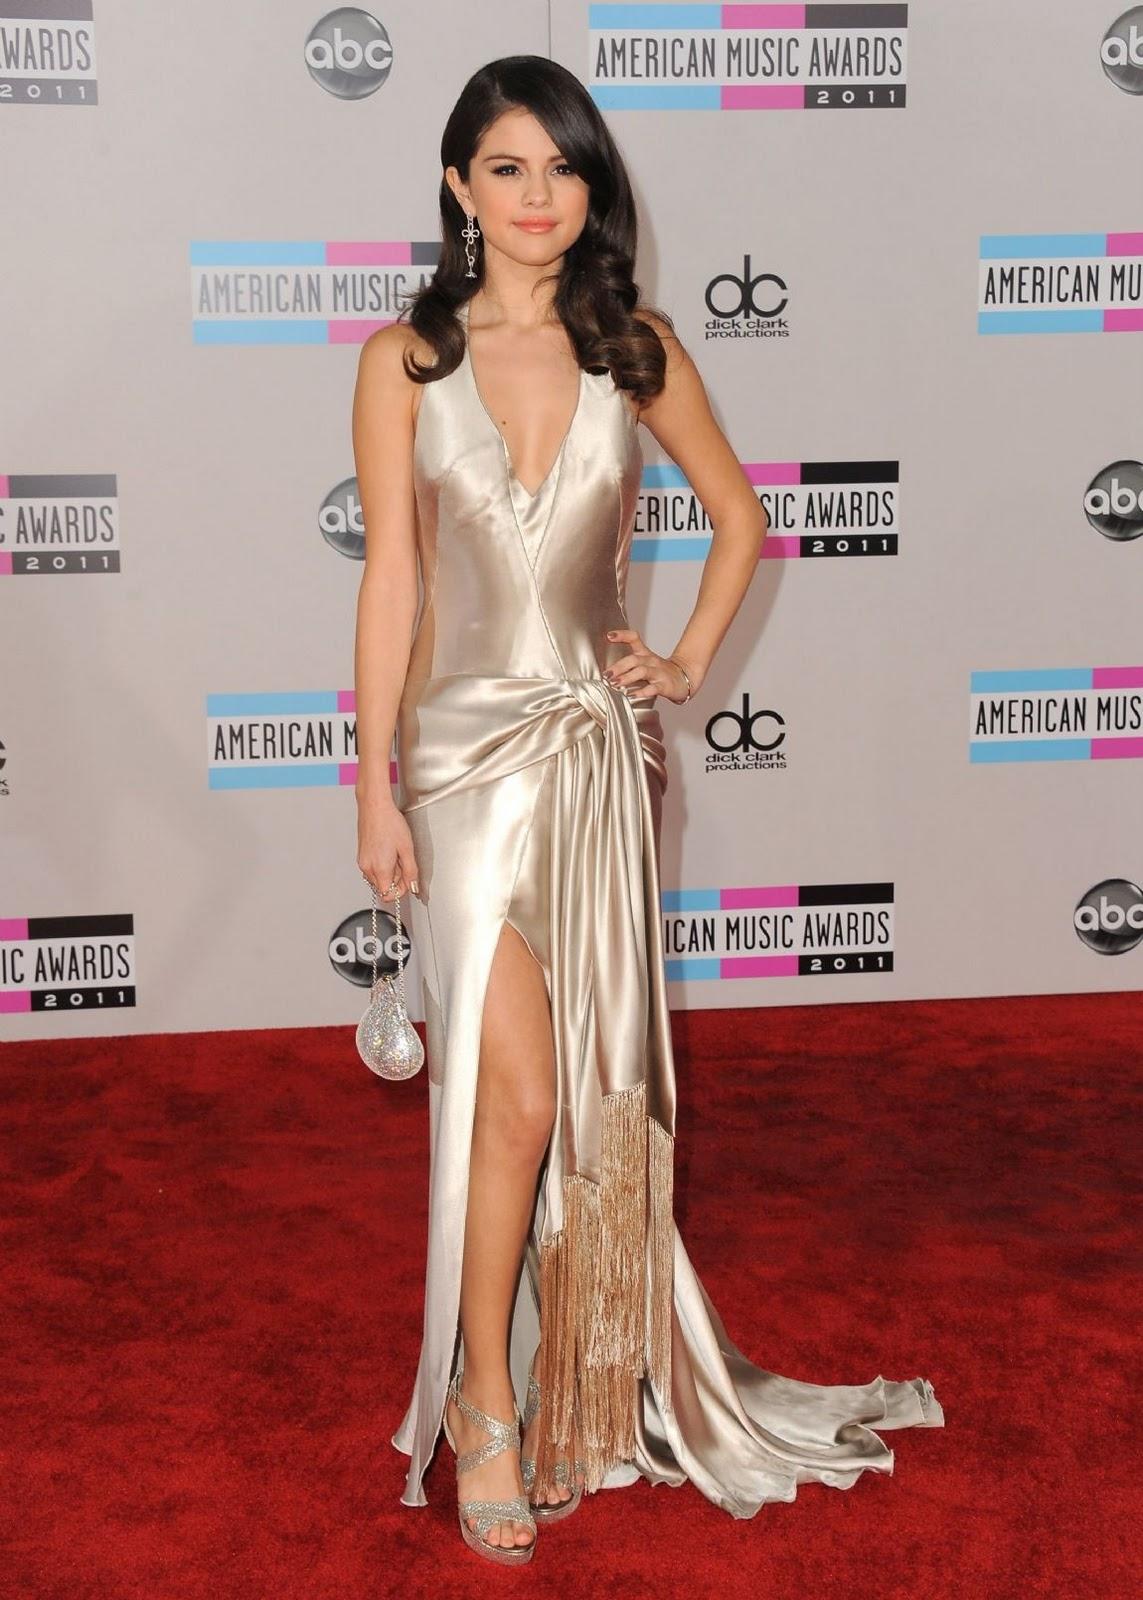 Taylor Swift in 2011 American Music Awards - Zimbio